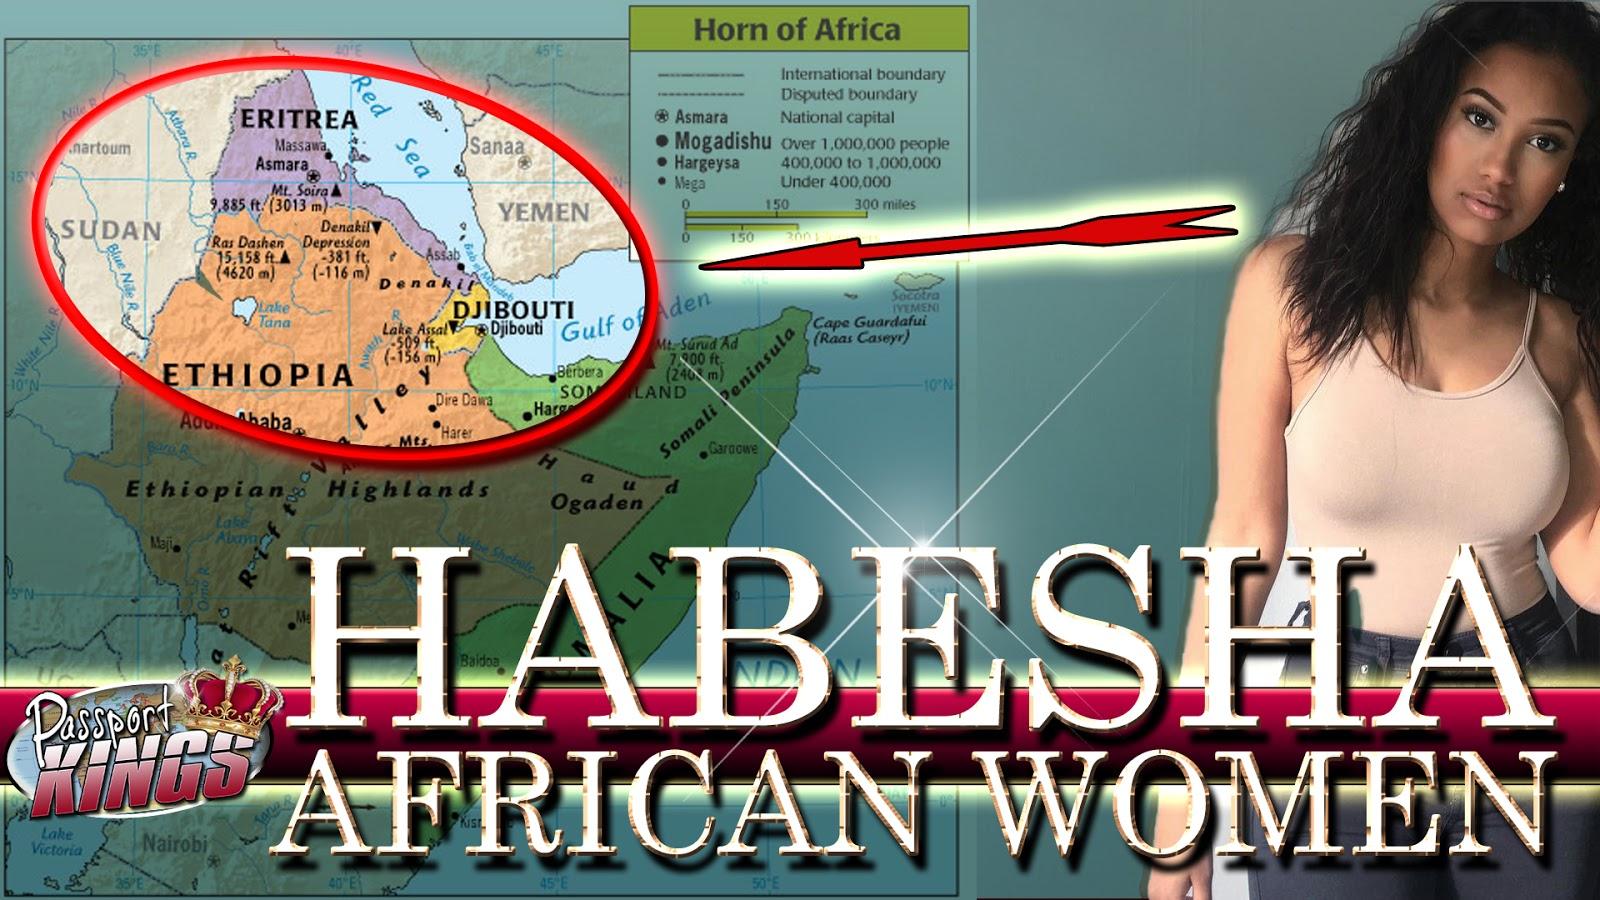 Sexy Habesha Women